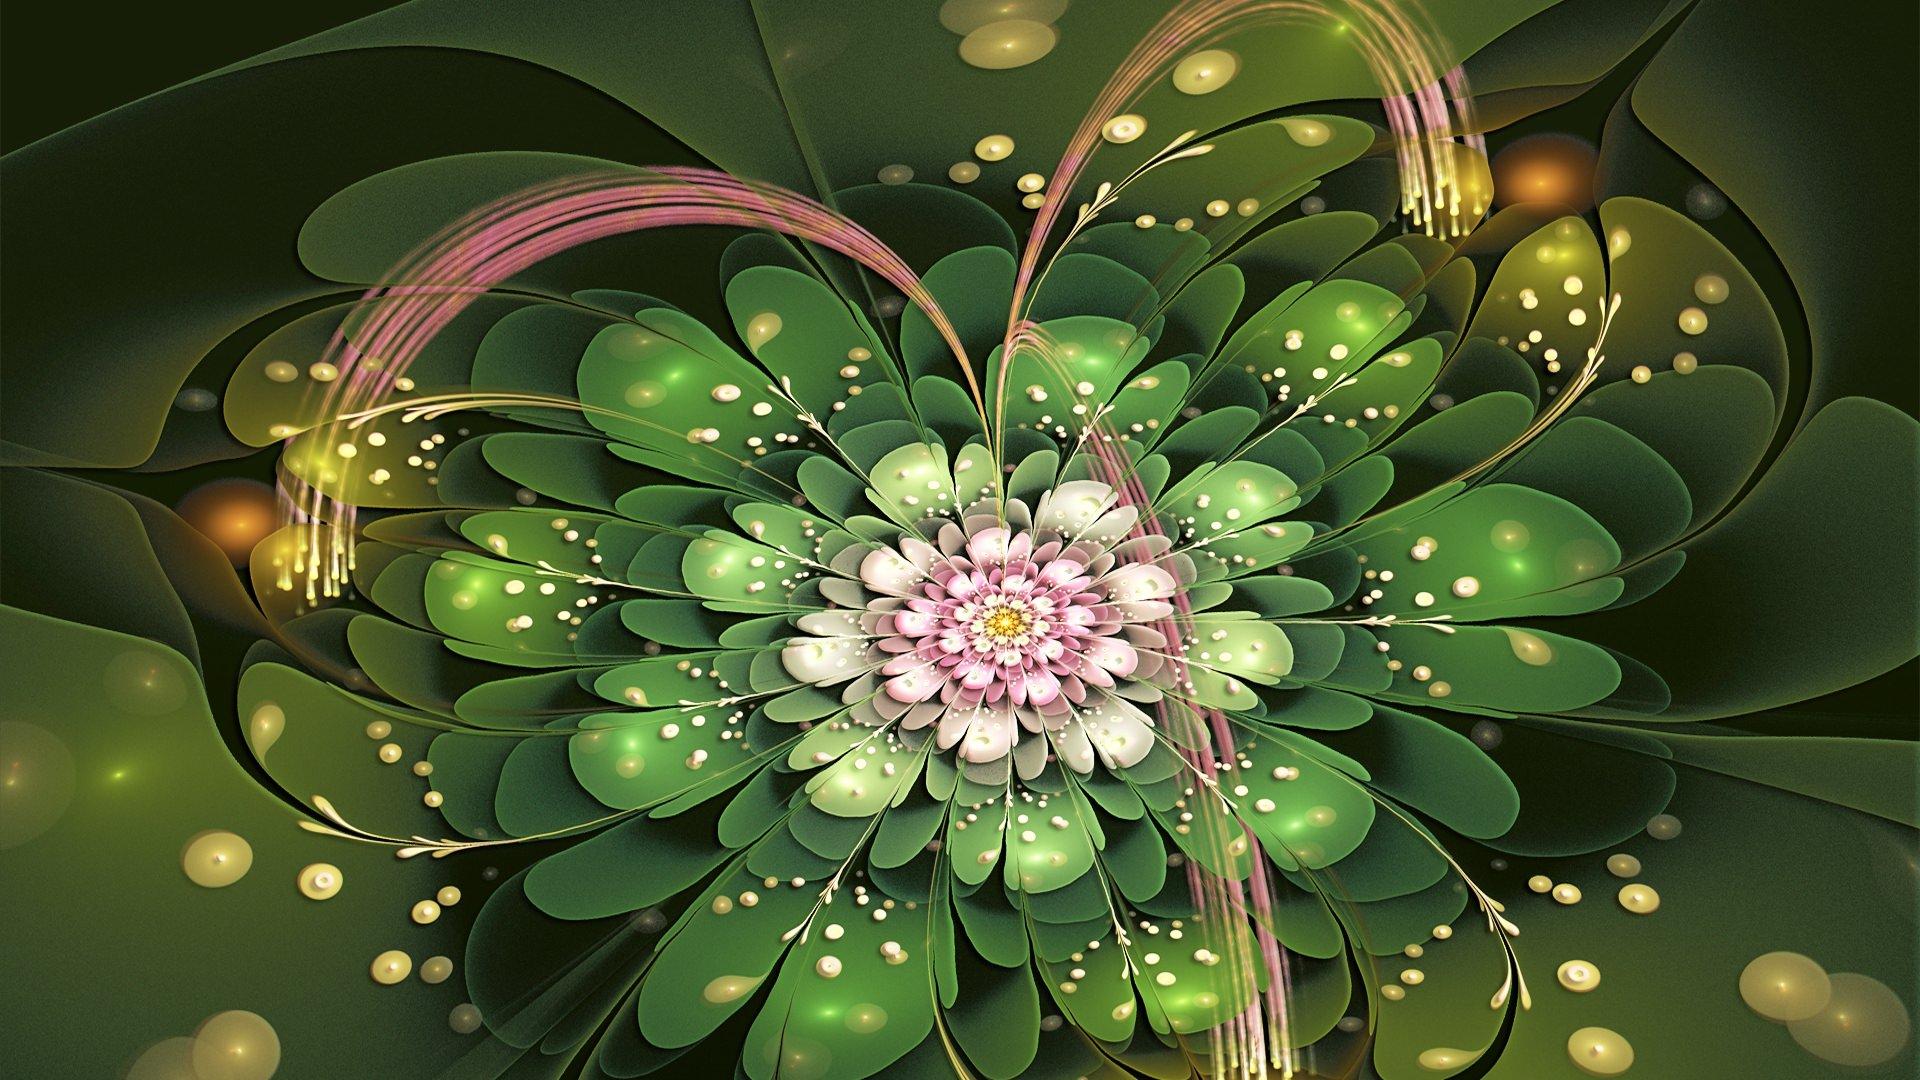 Fractal-Flower-Petals-Green-and-Pink-1920×1080-wallpaper-wp3605769